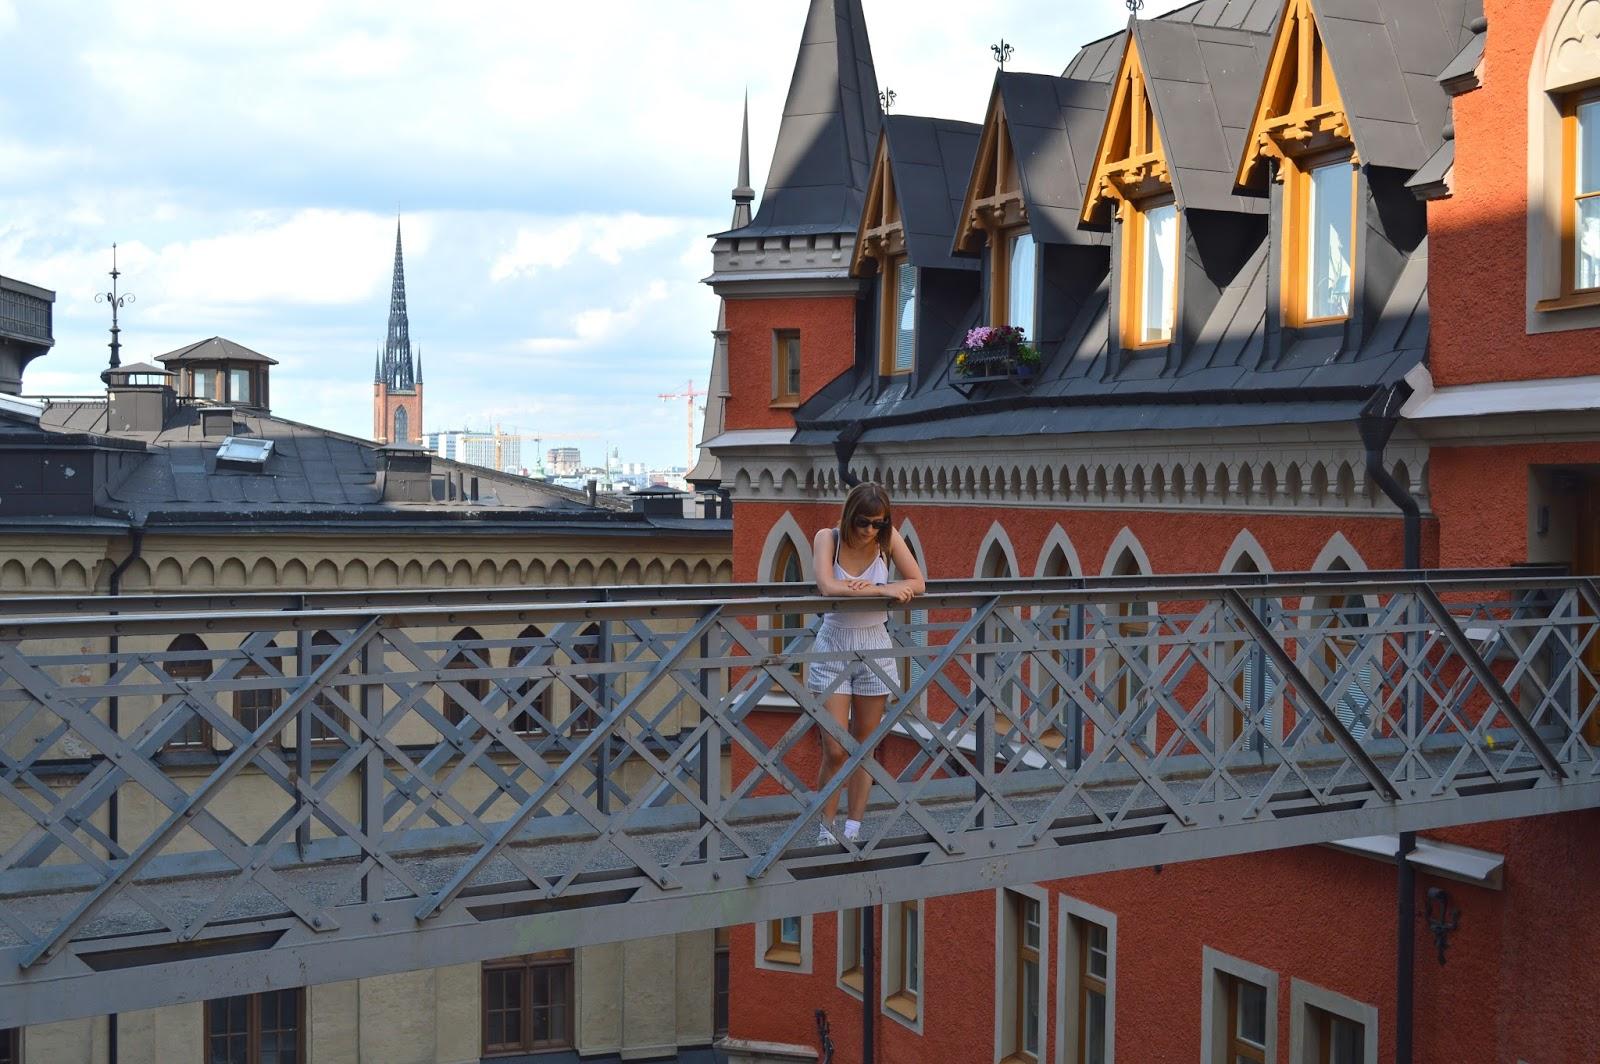 Buildings in Sodermalm, Stockholm